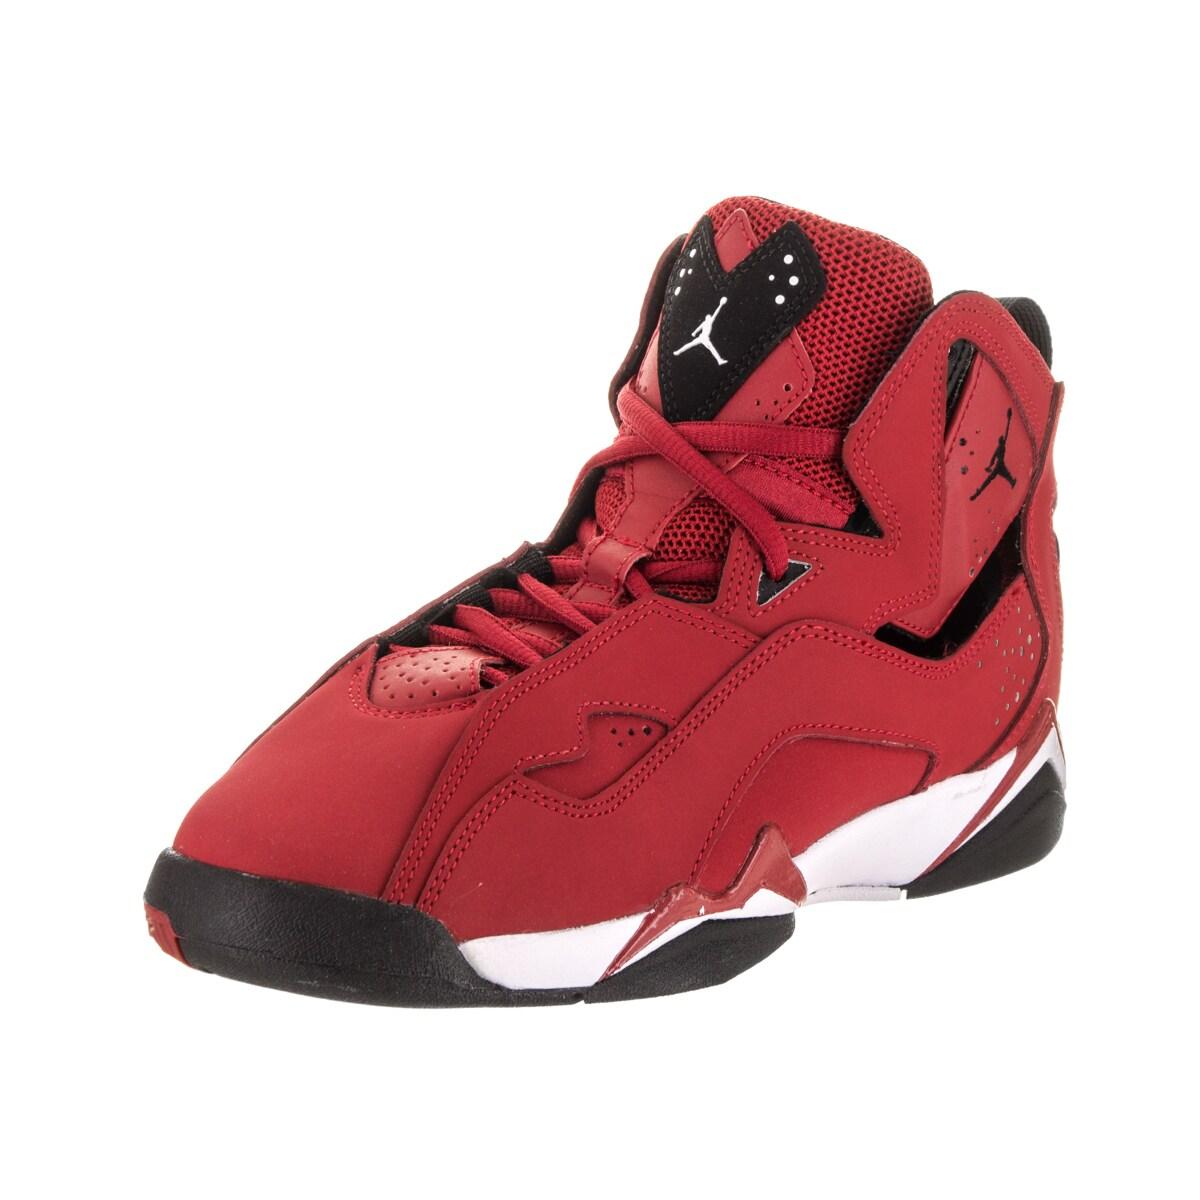 Nike Jordan Kids Jordan True Flight Red/Black Basketball ...